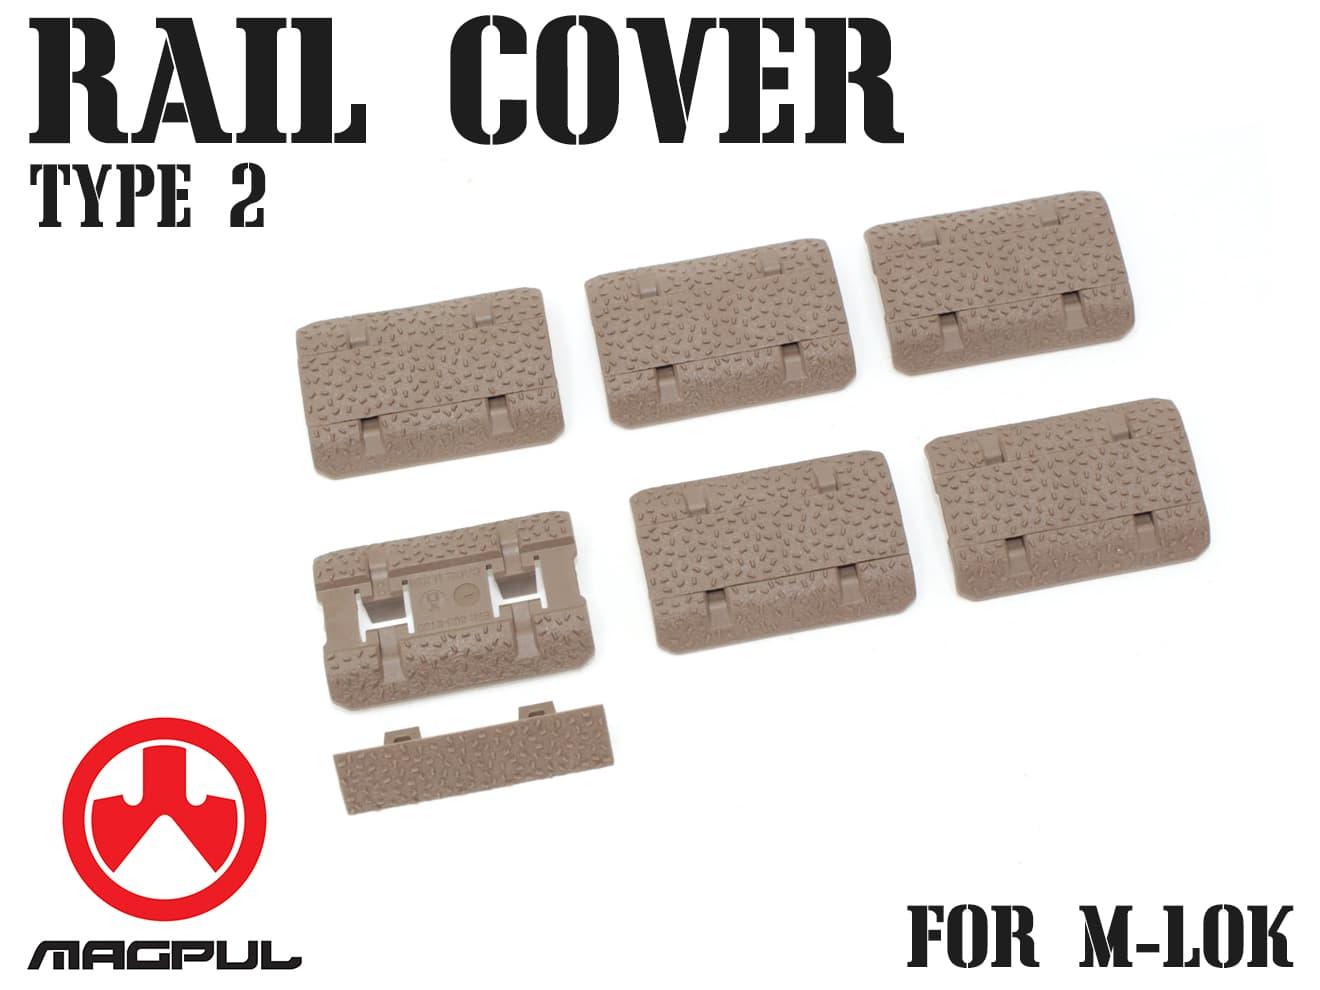 MAGPUL M-Lok レイルカバー Type2 DE◆ハンドガード/Mロック/マグプル/実物/レイルガード/正規品/ダークアース/RAS/レイルプロテクター